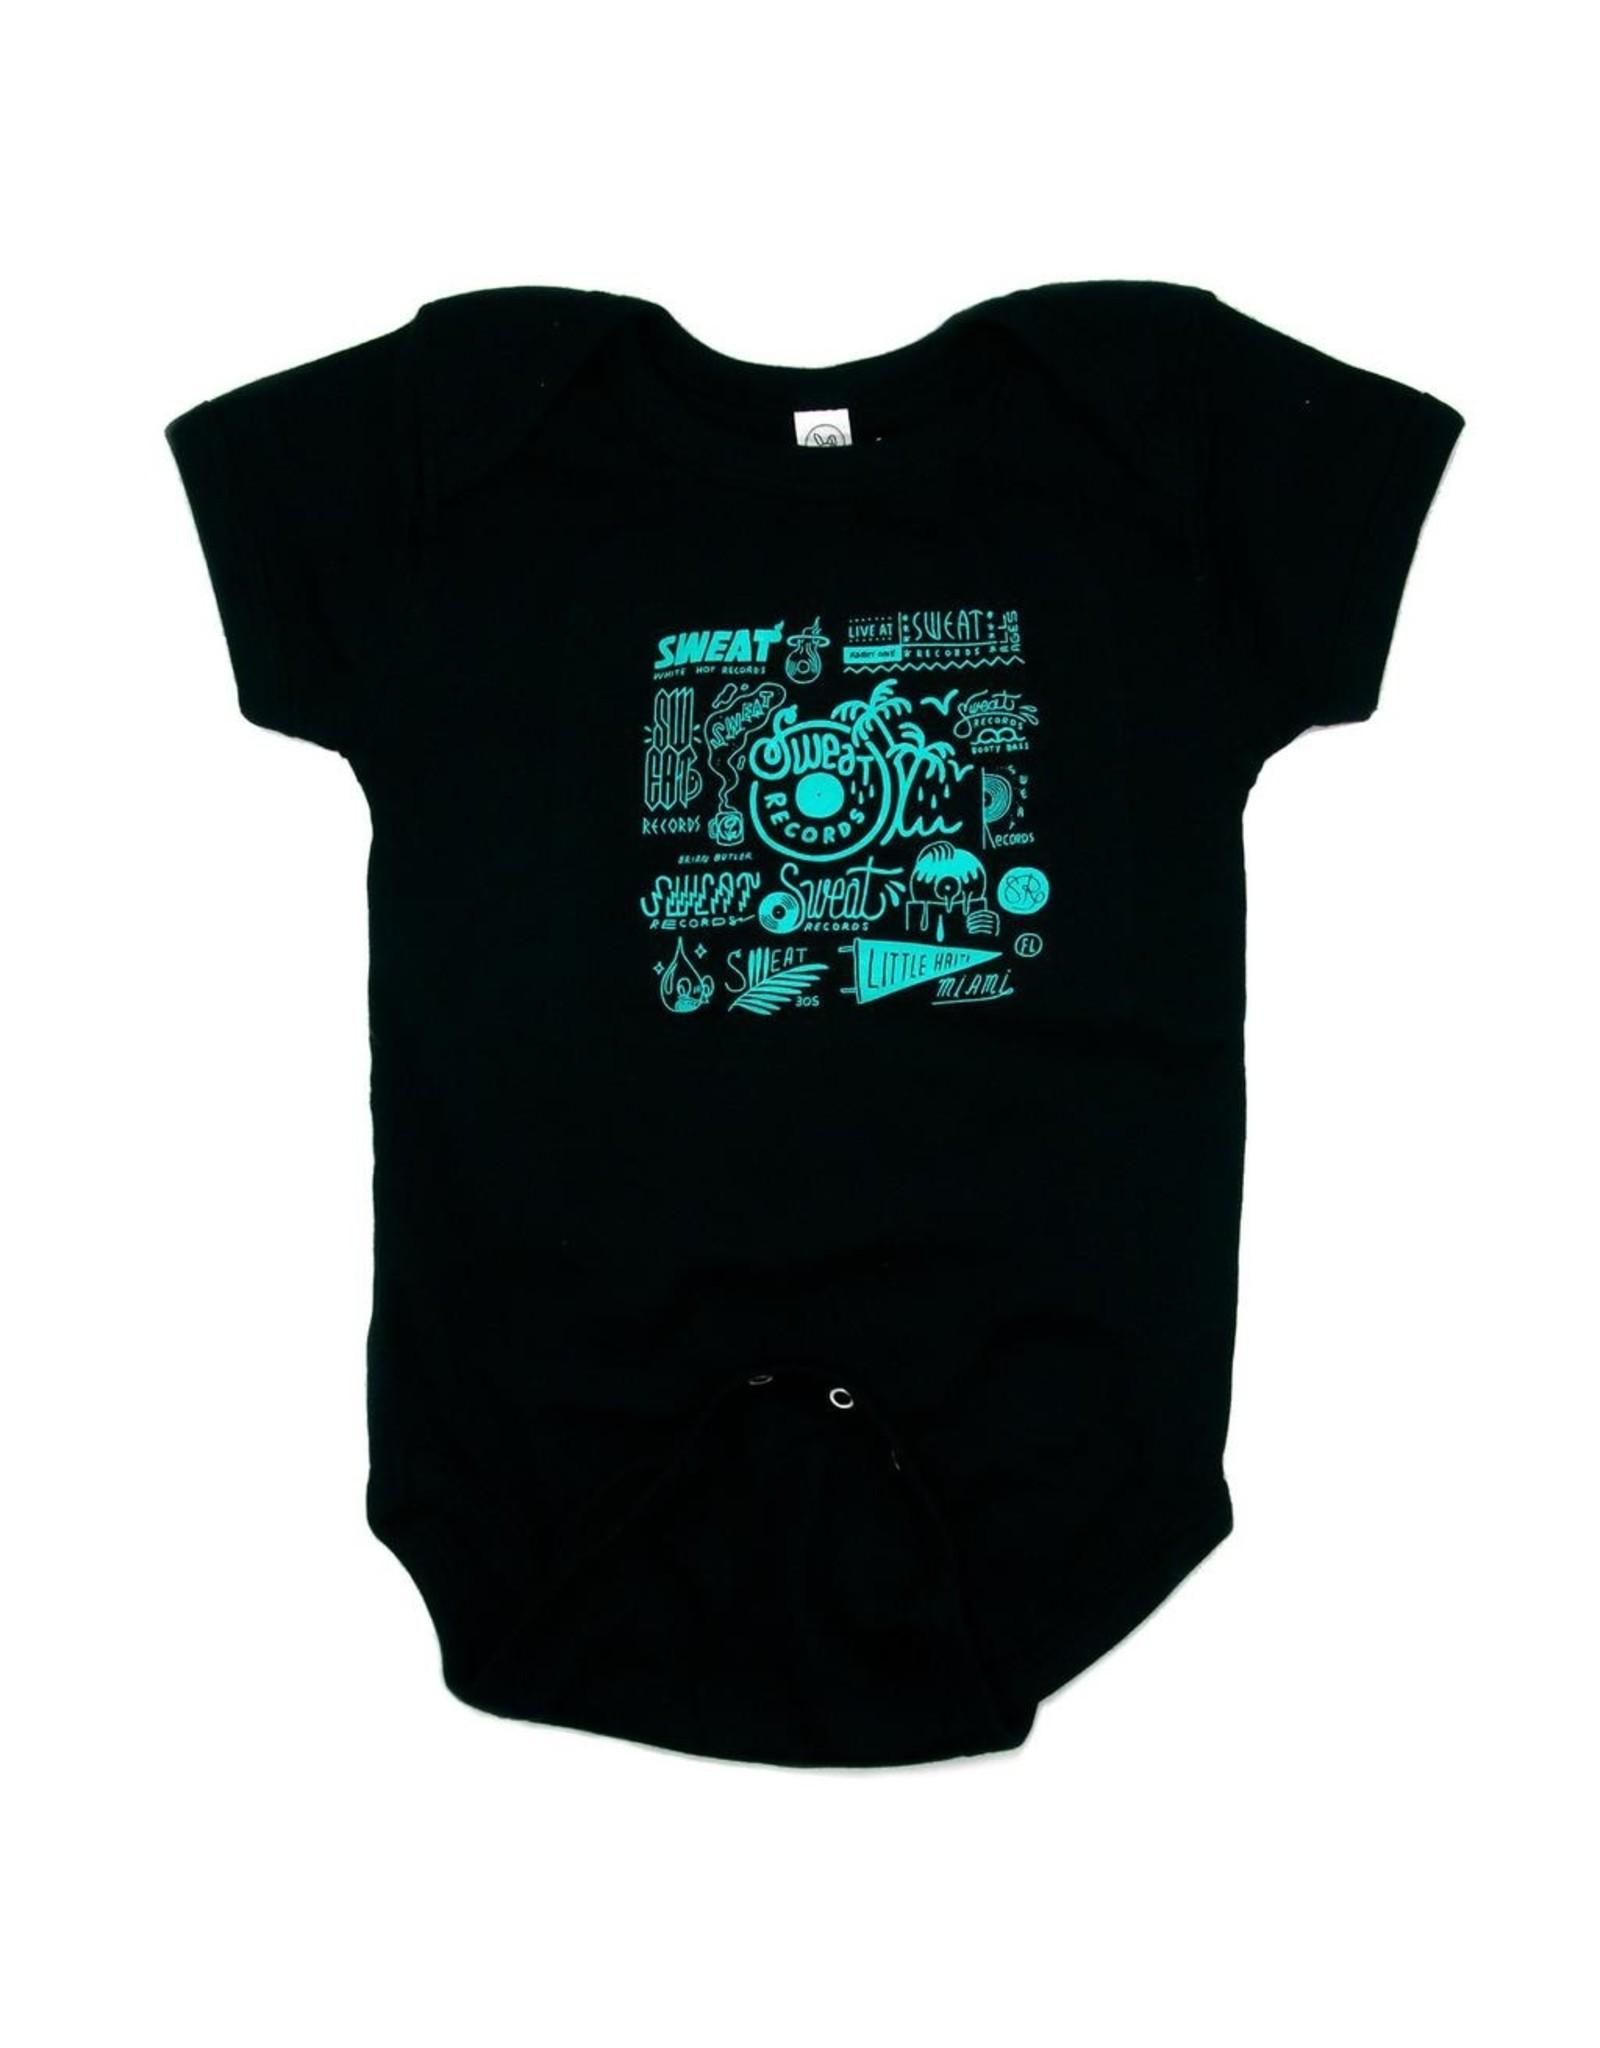 "Shirt Sweat x Brian Butler ""Logo Sheet"" Baby Onesie"